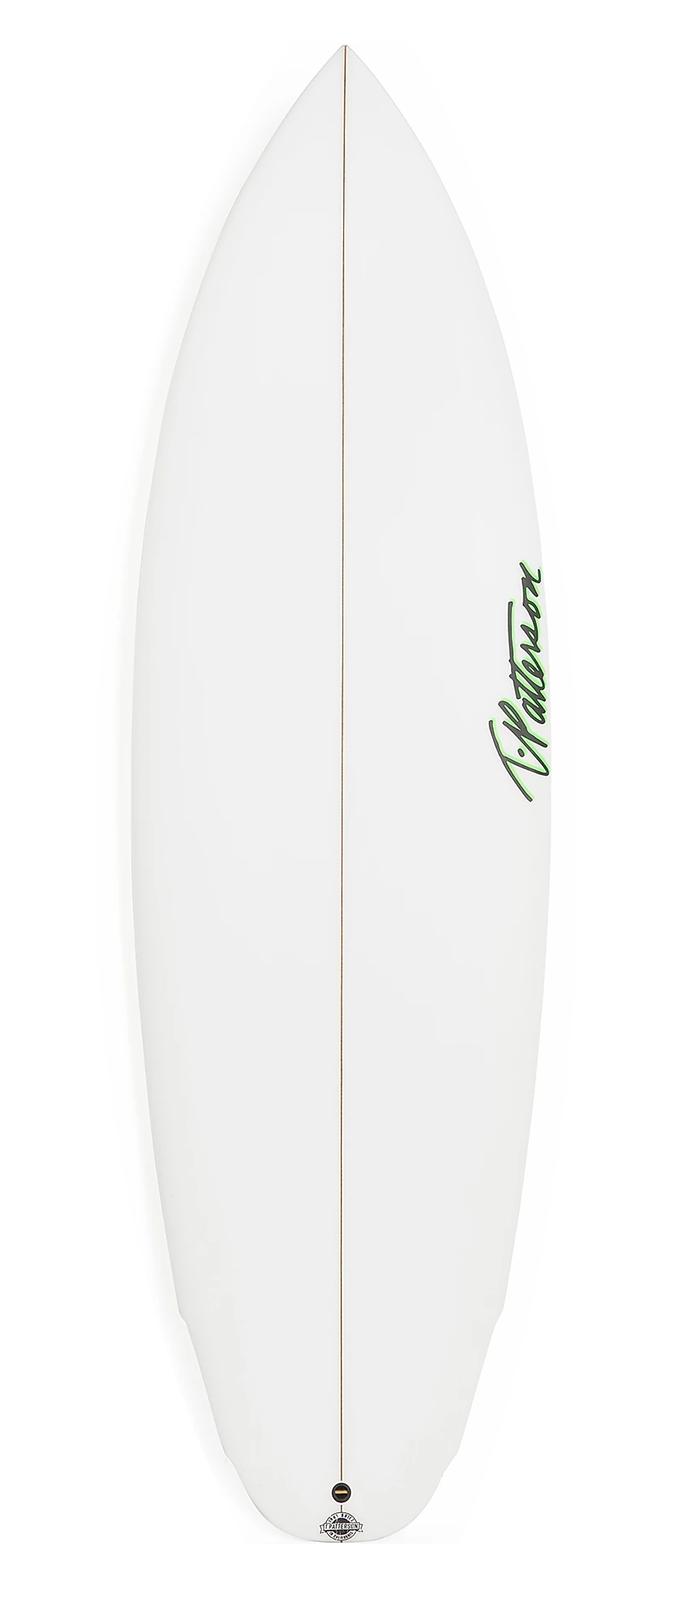 RISING SUN surfboard model